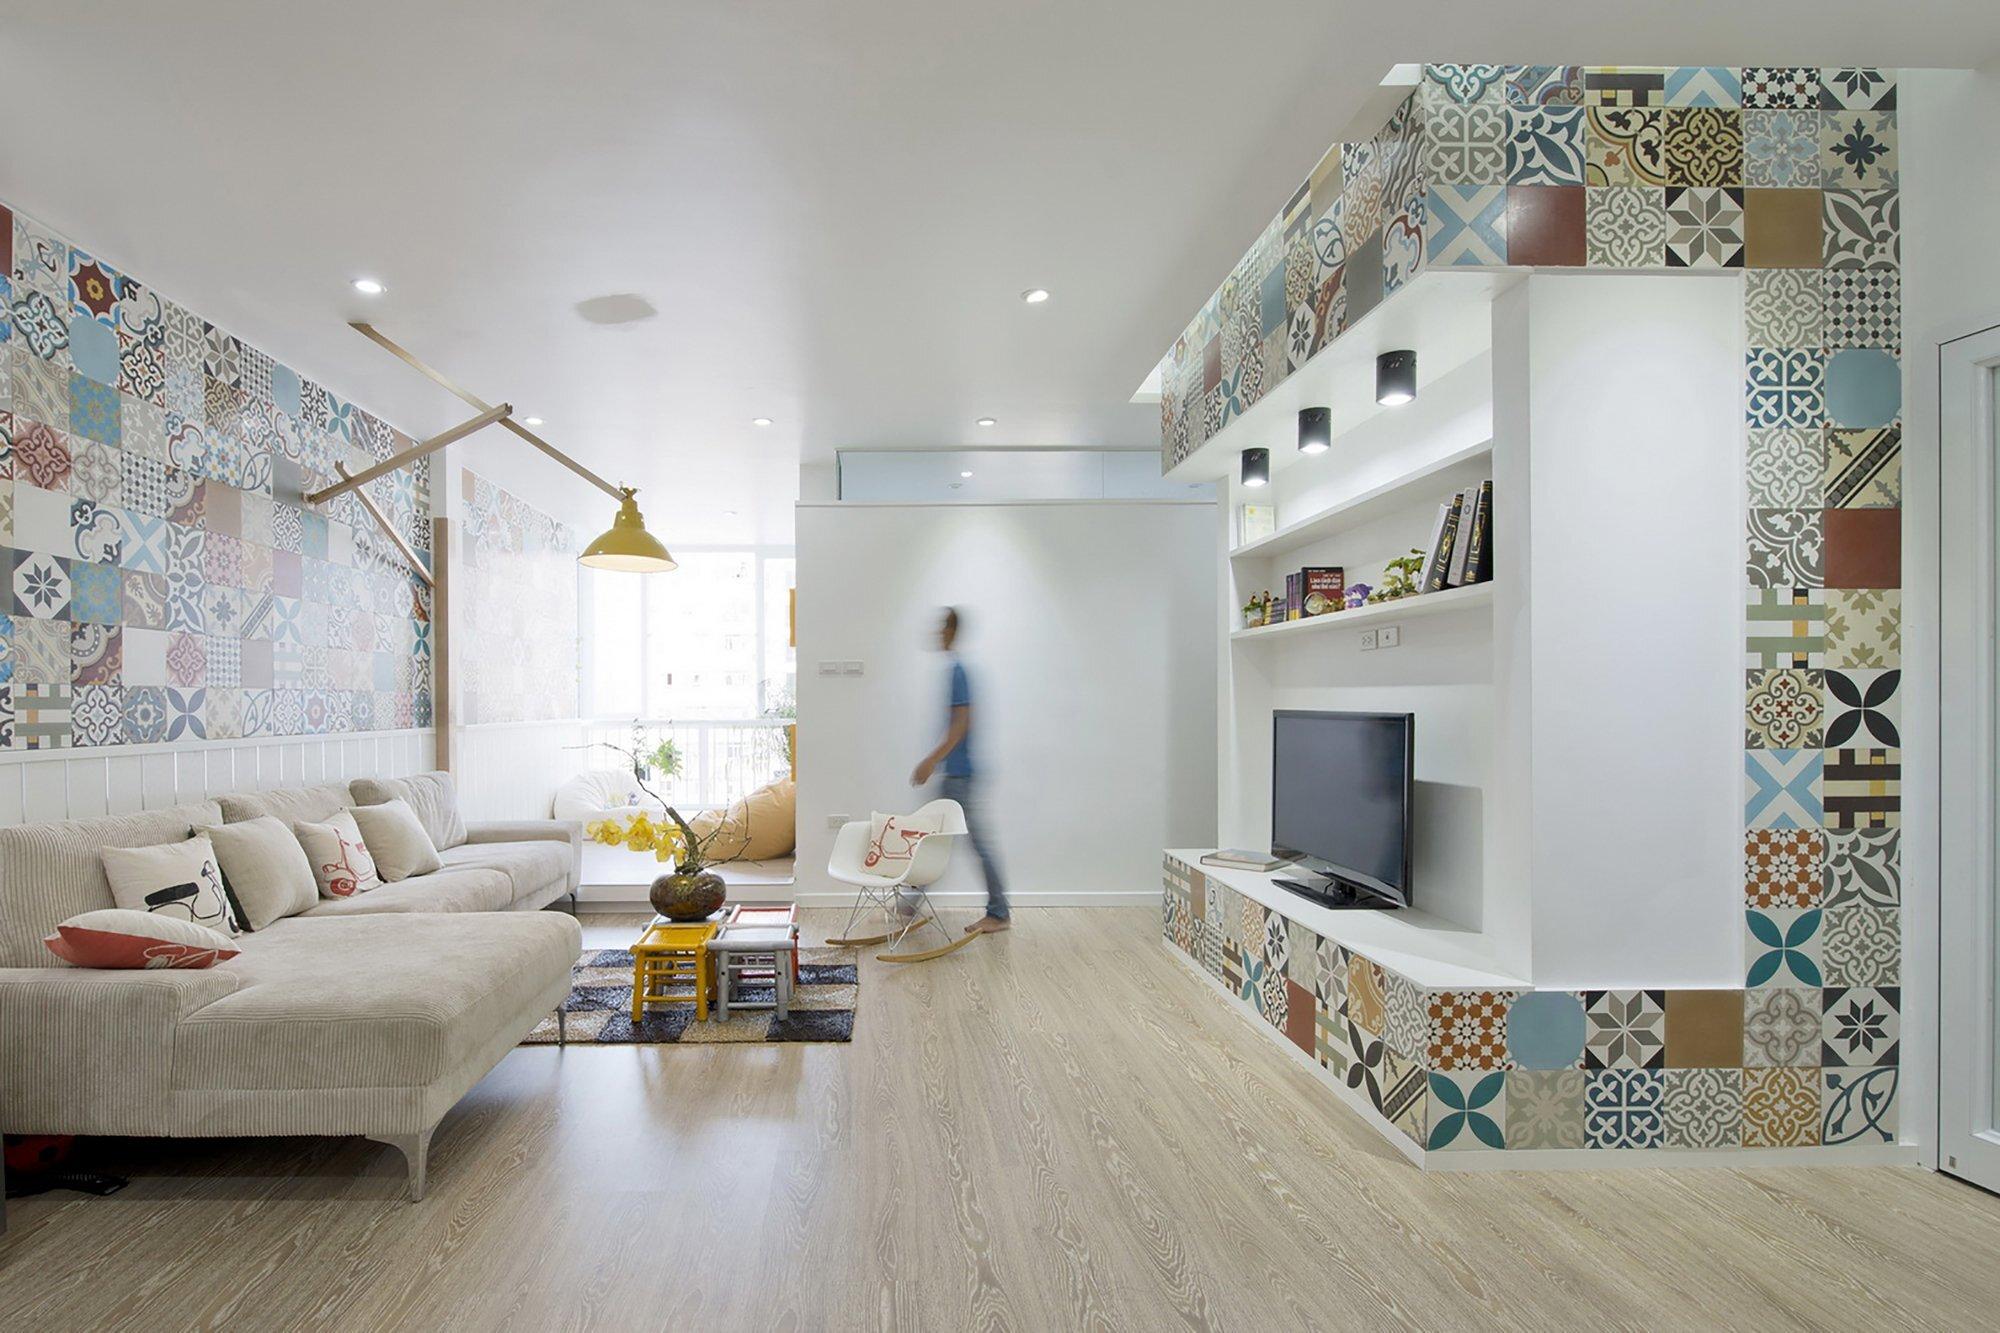 HT Apartment - Landmak Architect - Hanoi - Vietnam - Small Apartment - Living Room - Humble Homes